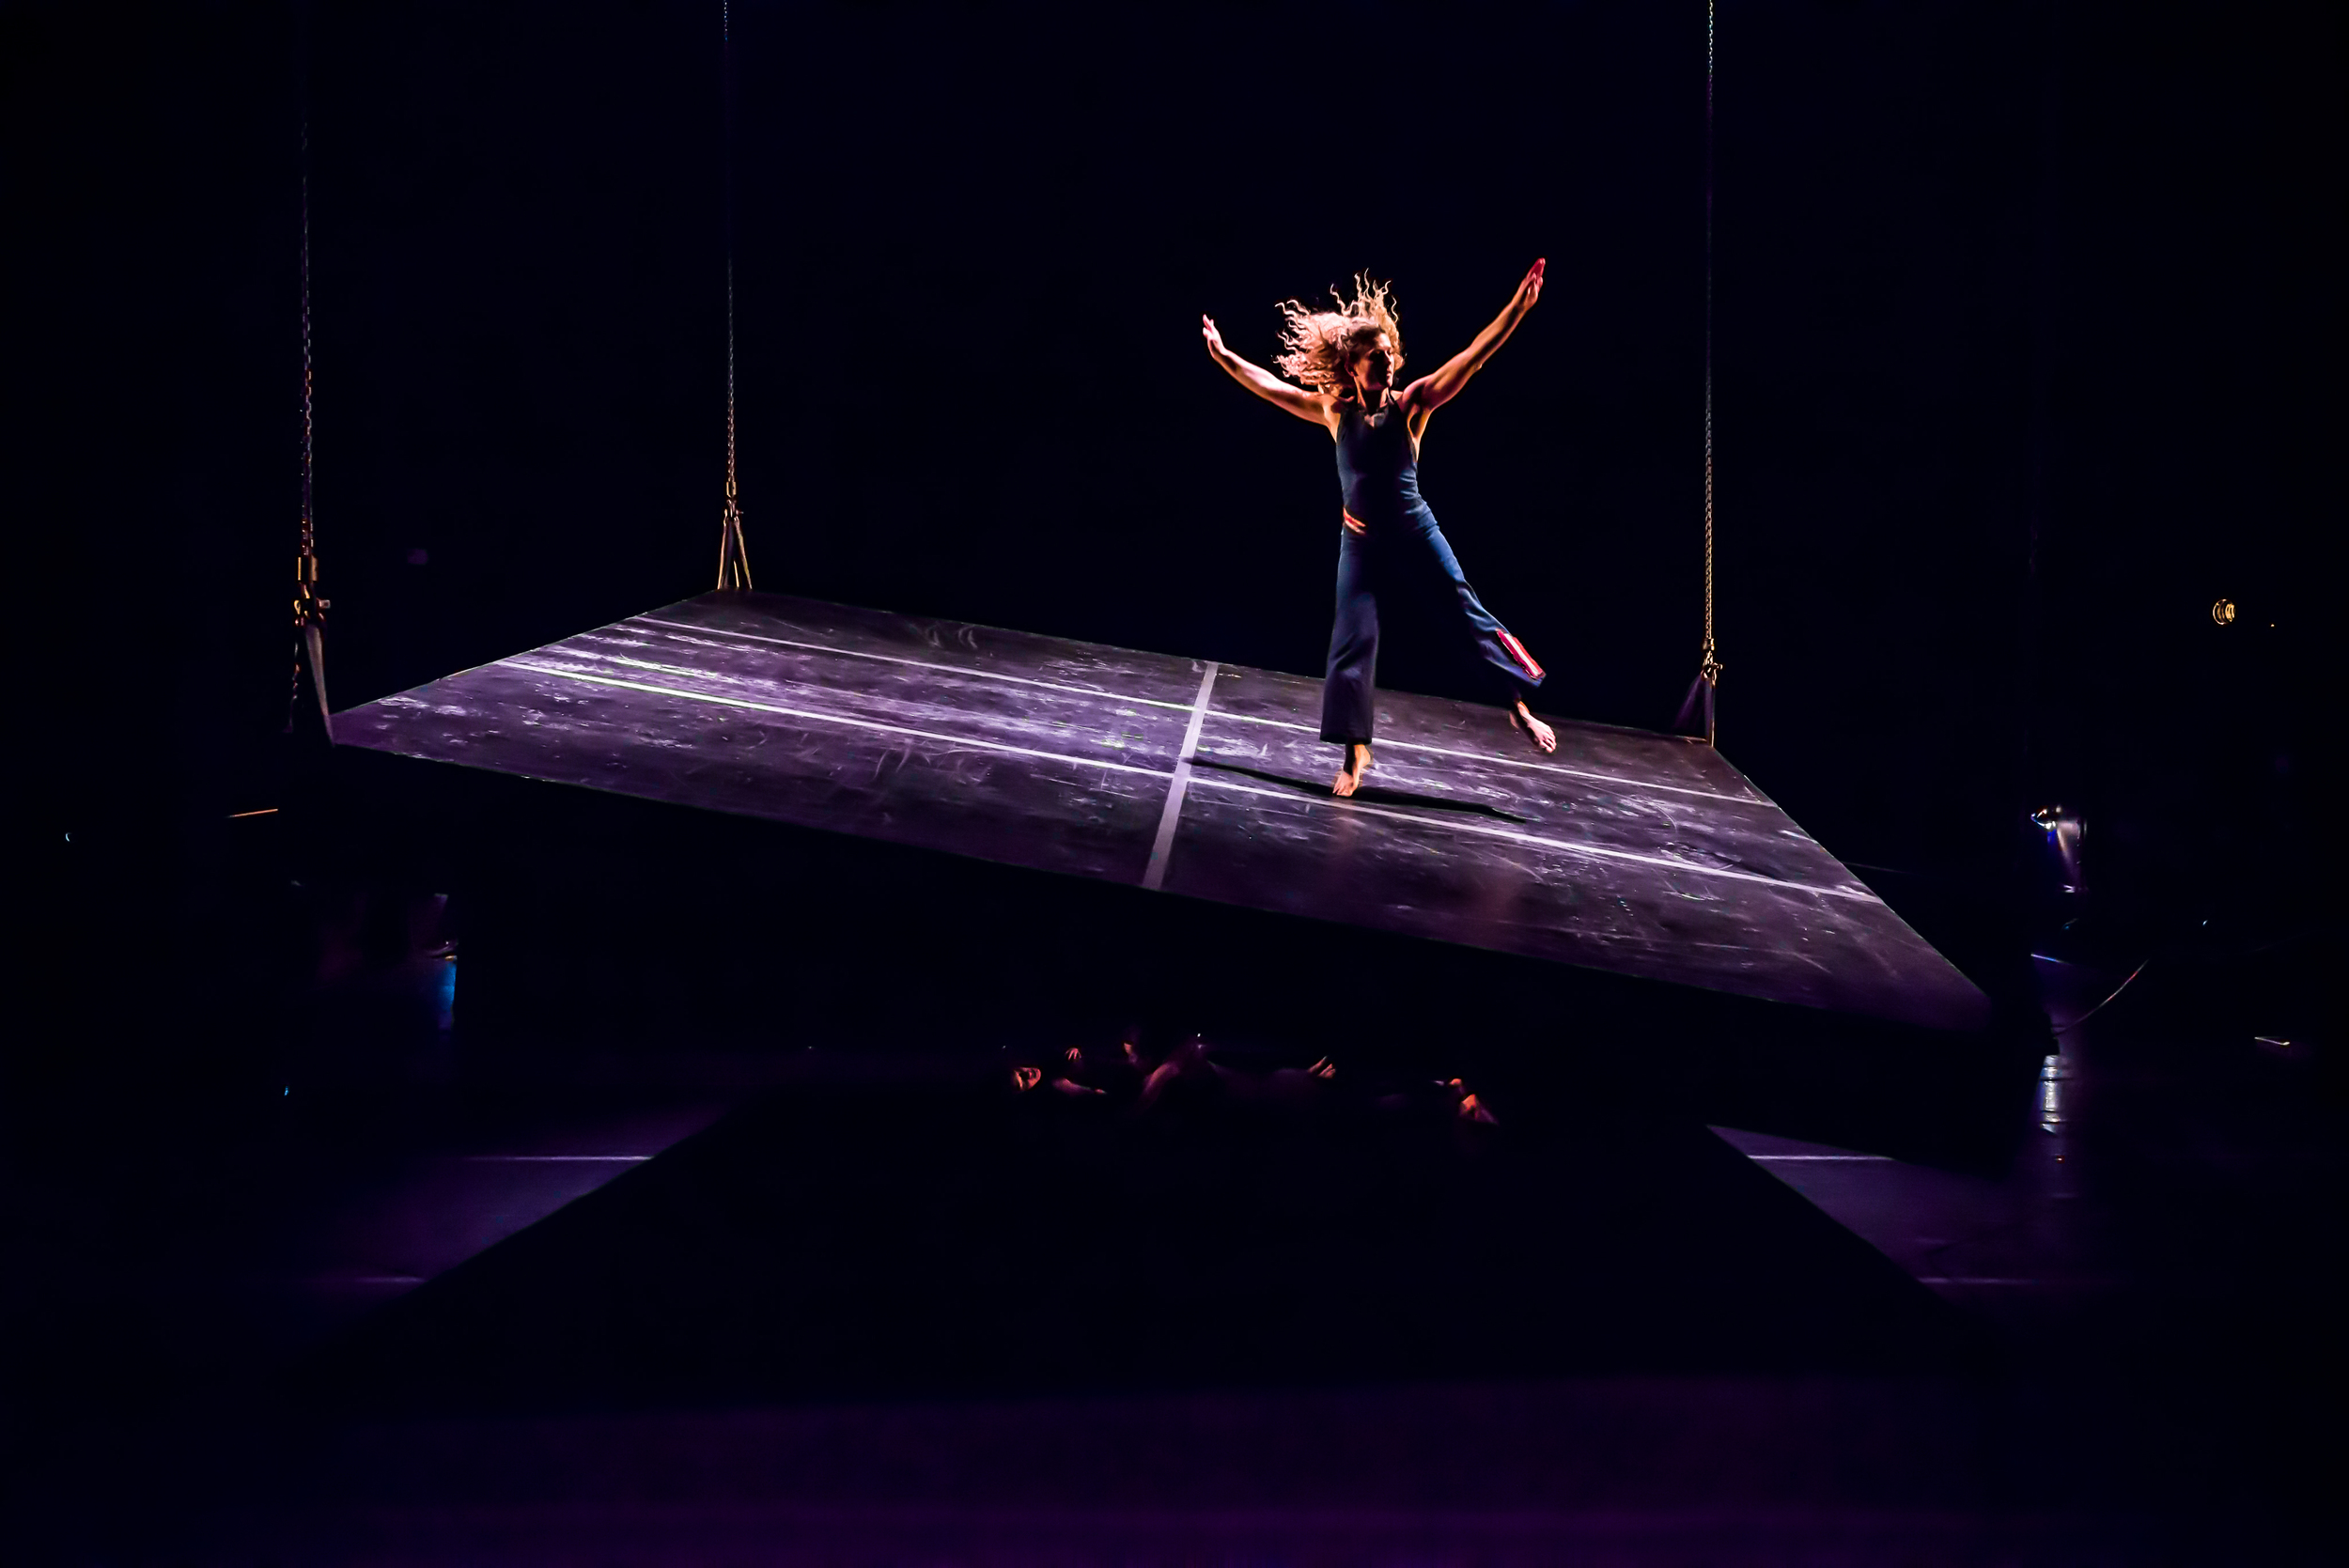 Stacey jump on diamond Hover 2015.jpg